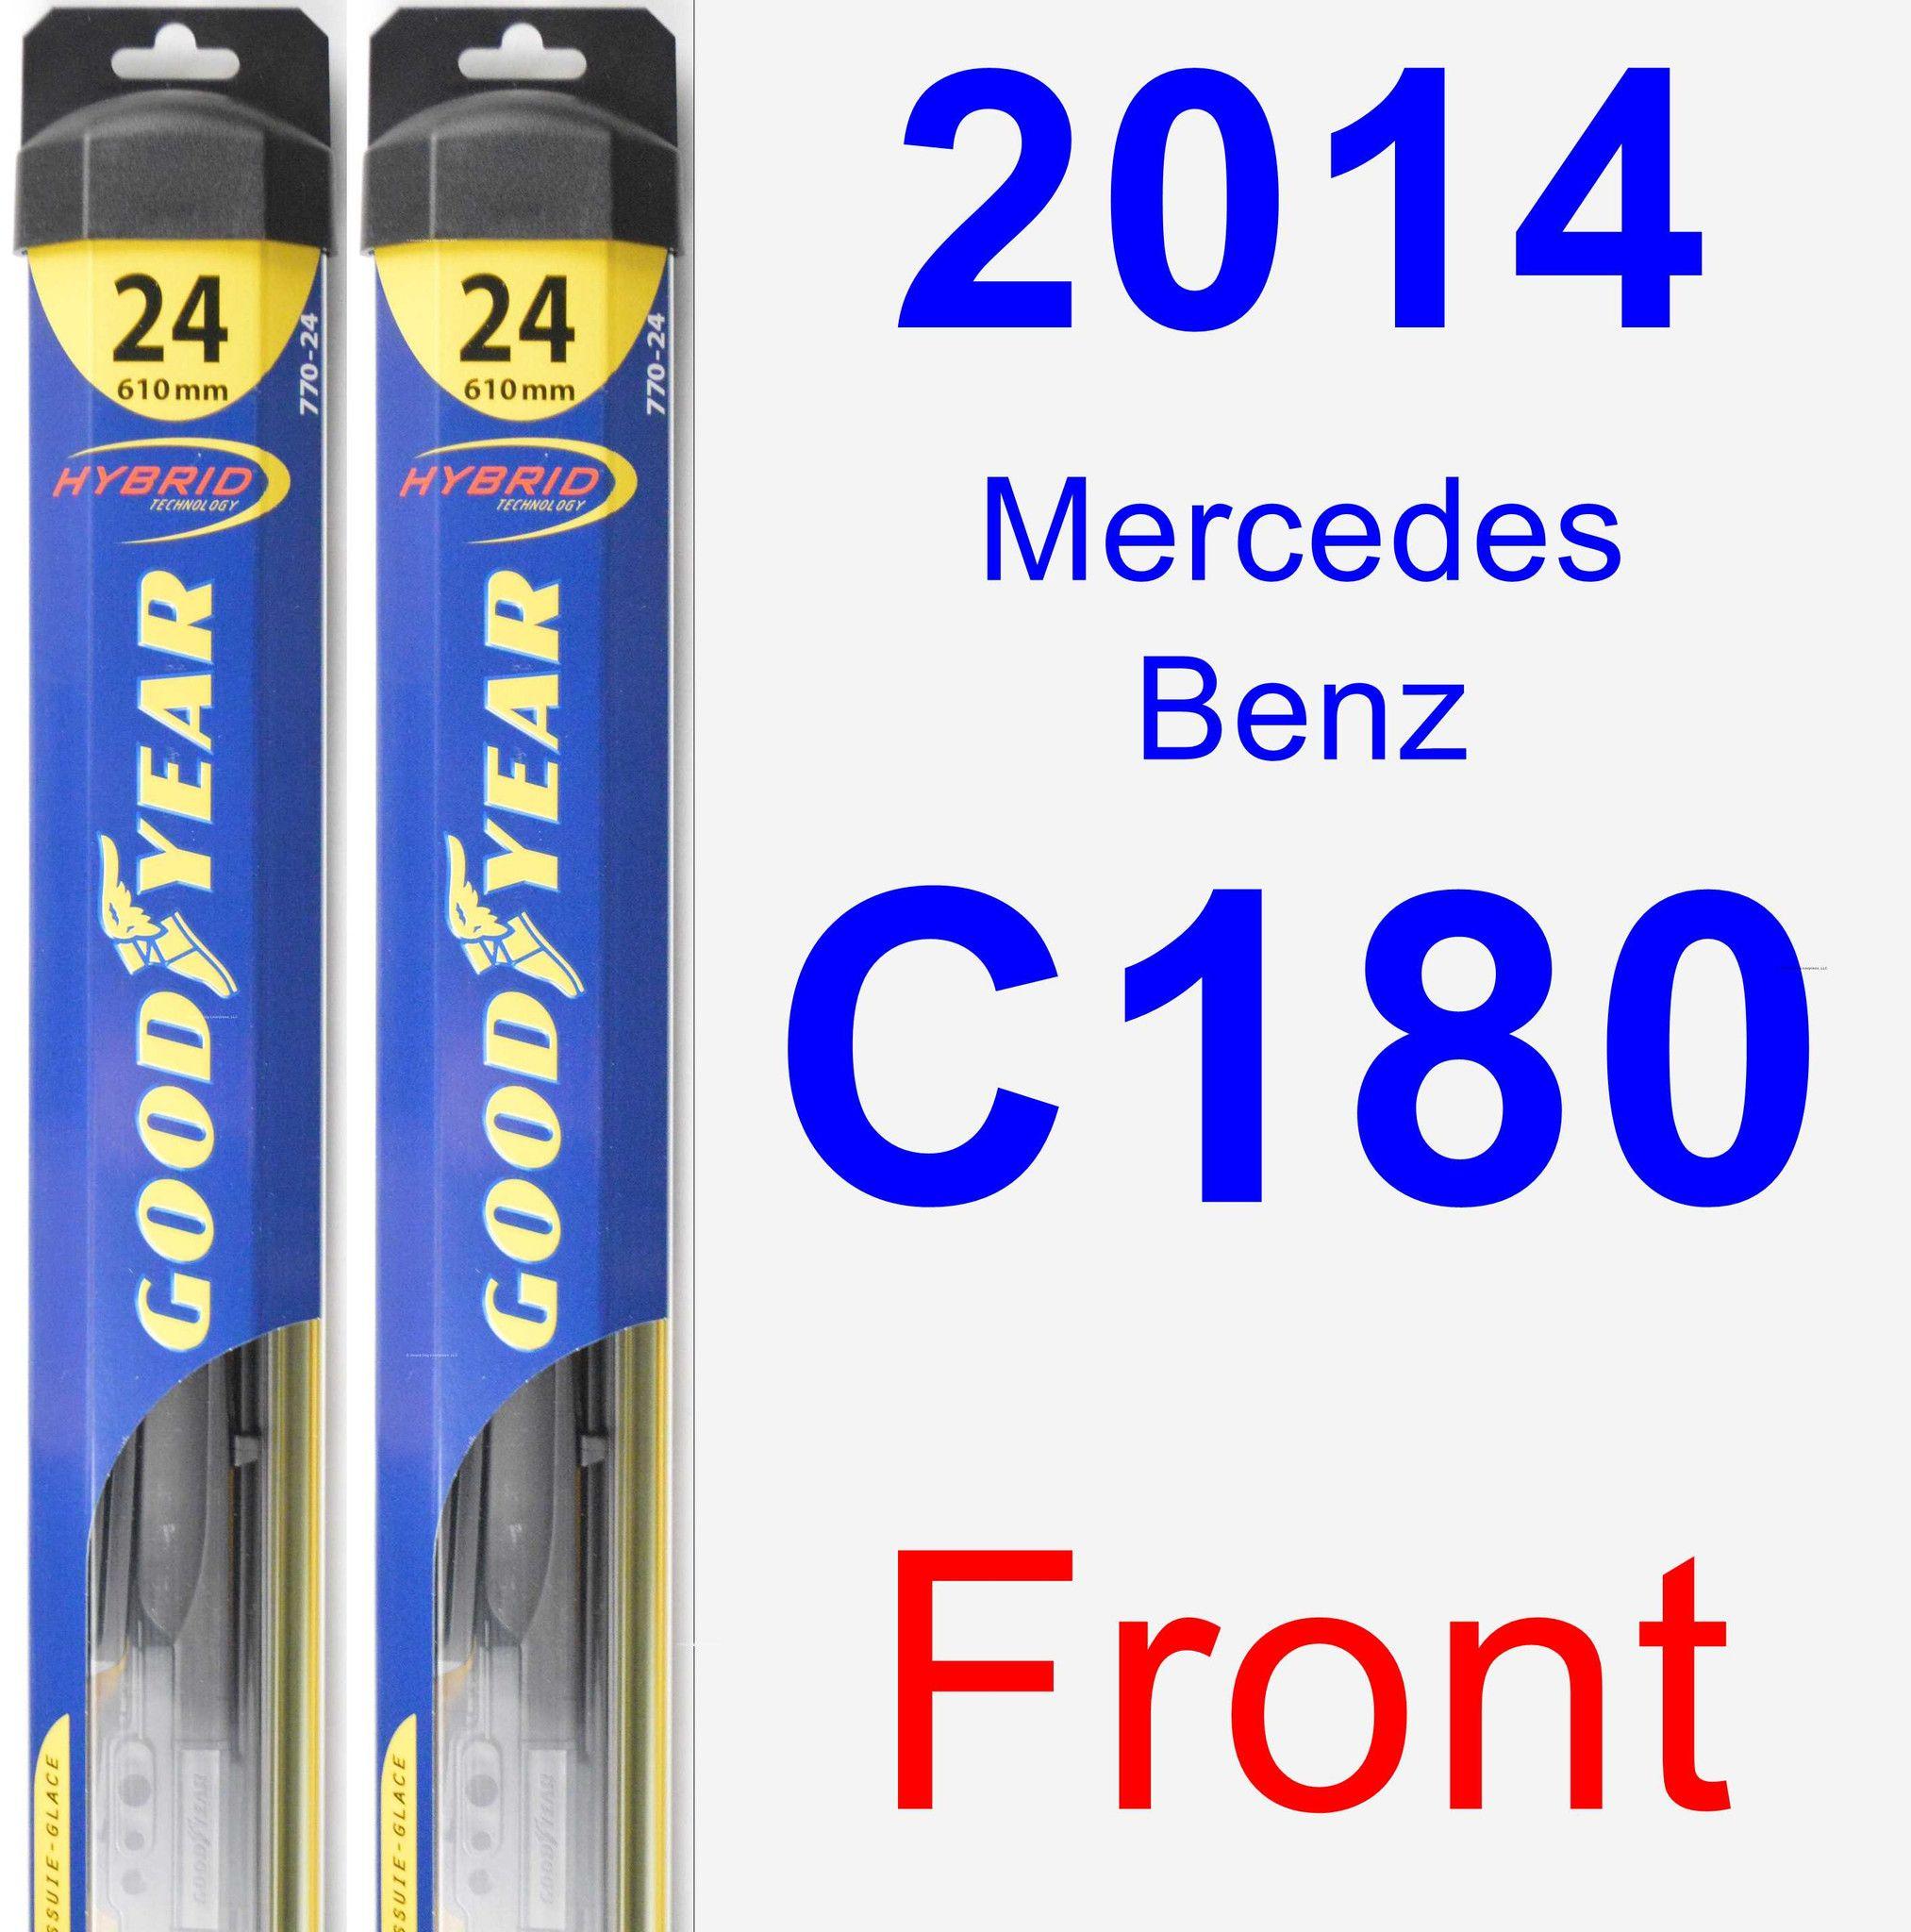 Front Wiper Blade Pack for 2014 Mercedes Benz C180 Hybrid